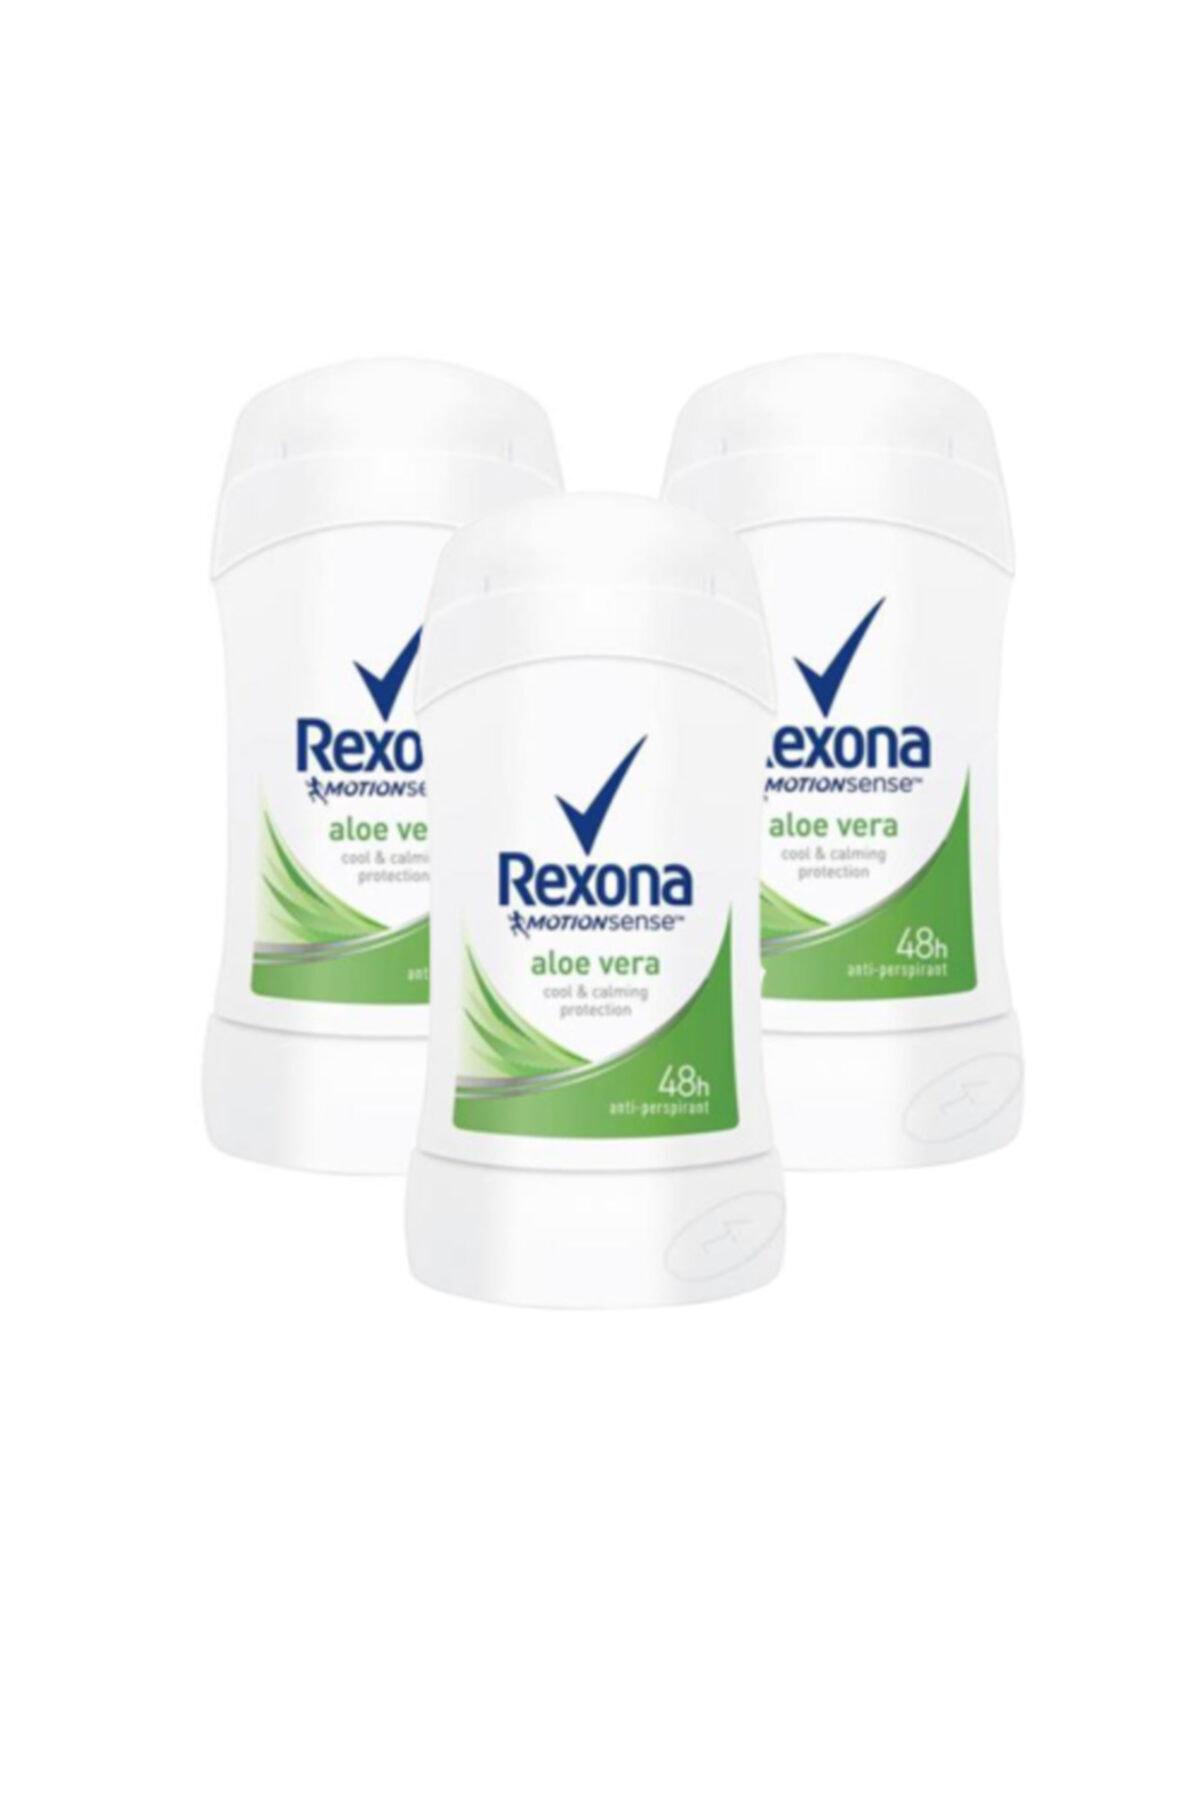 Rexona Aleo Vera Stick X 3 1